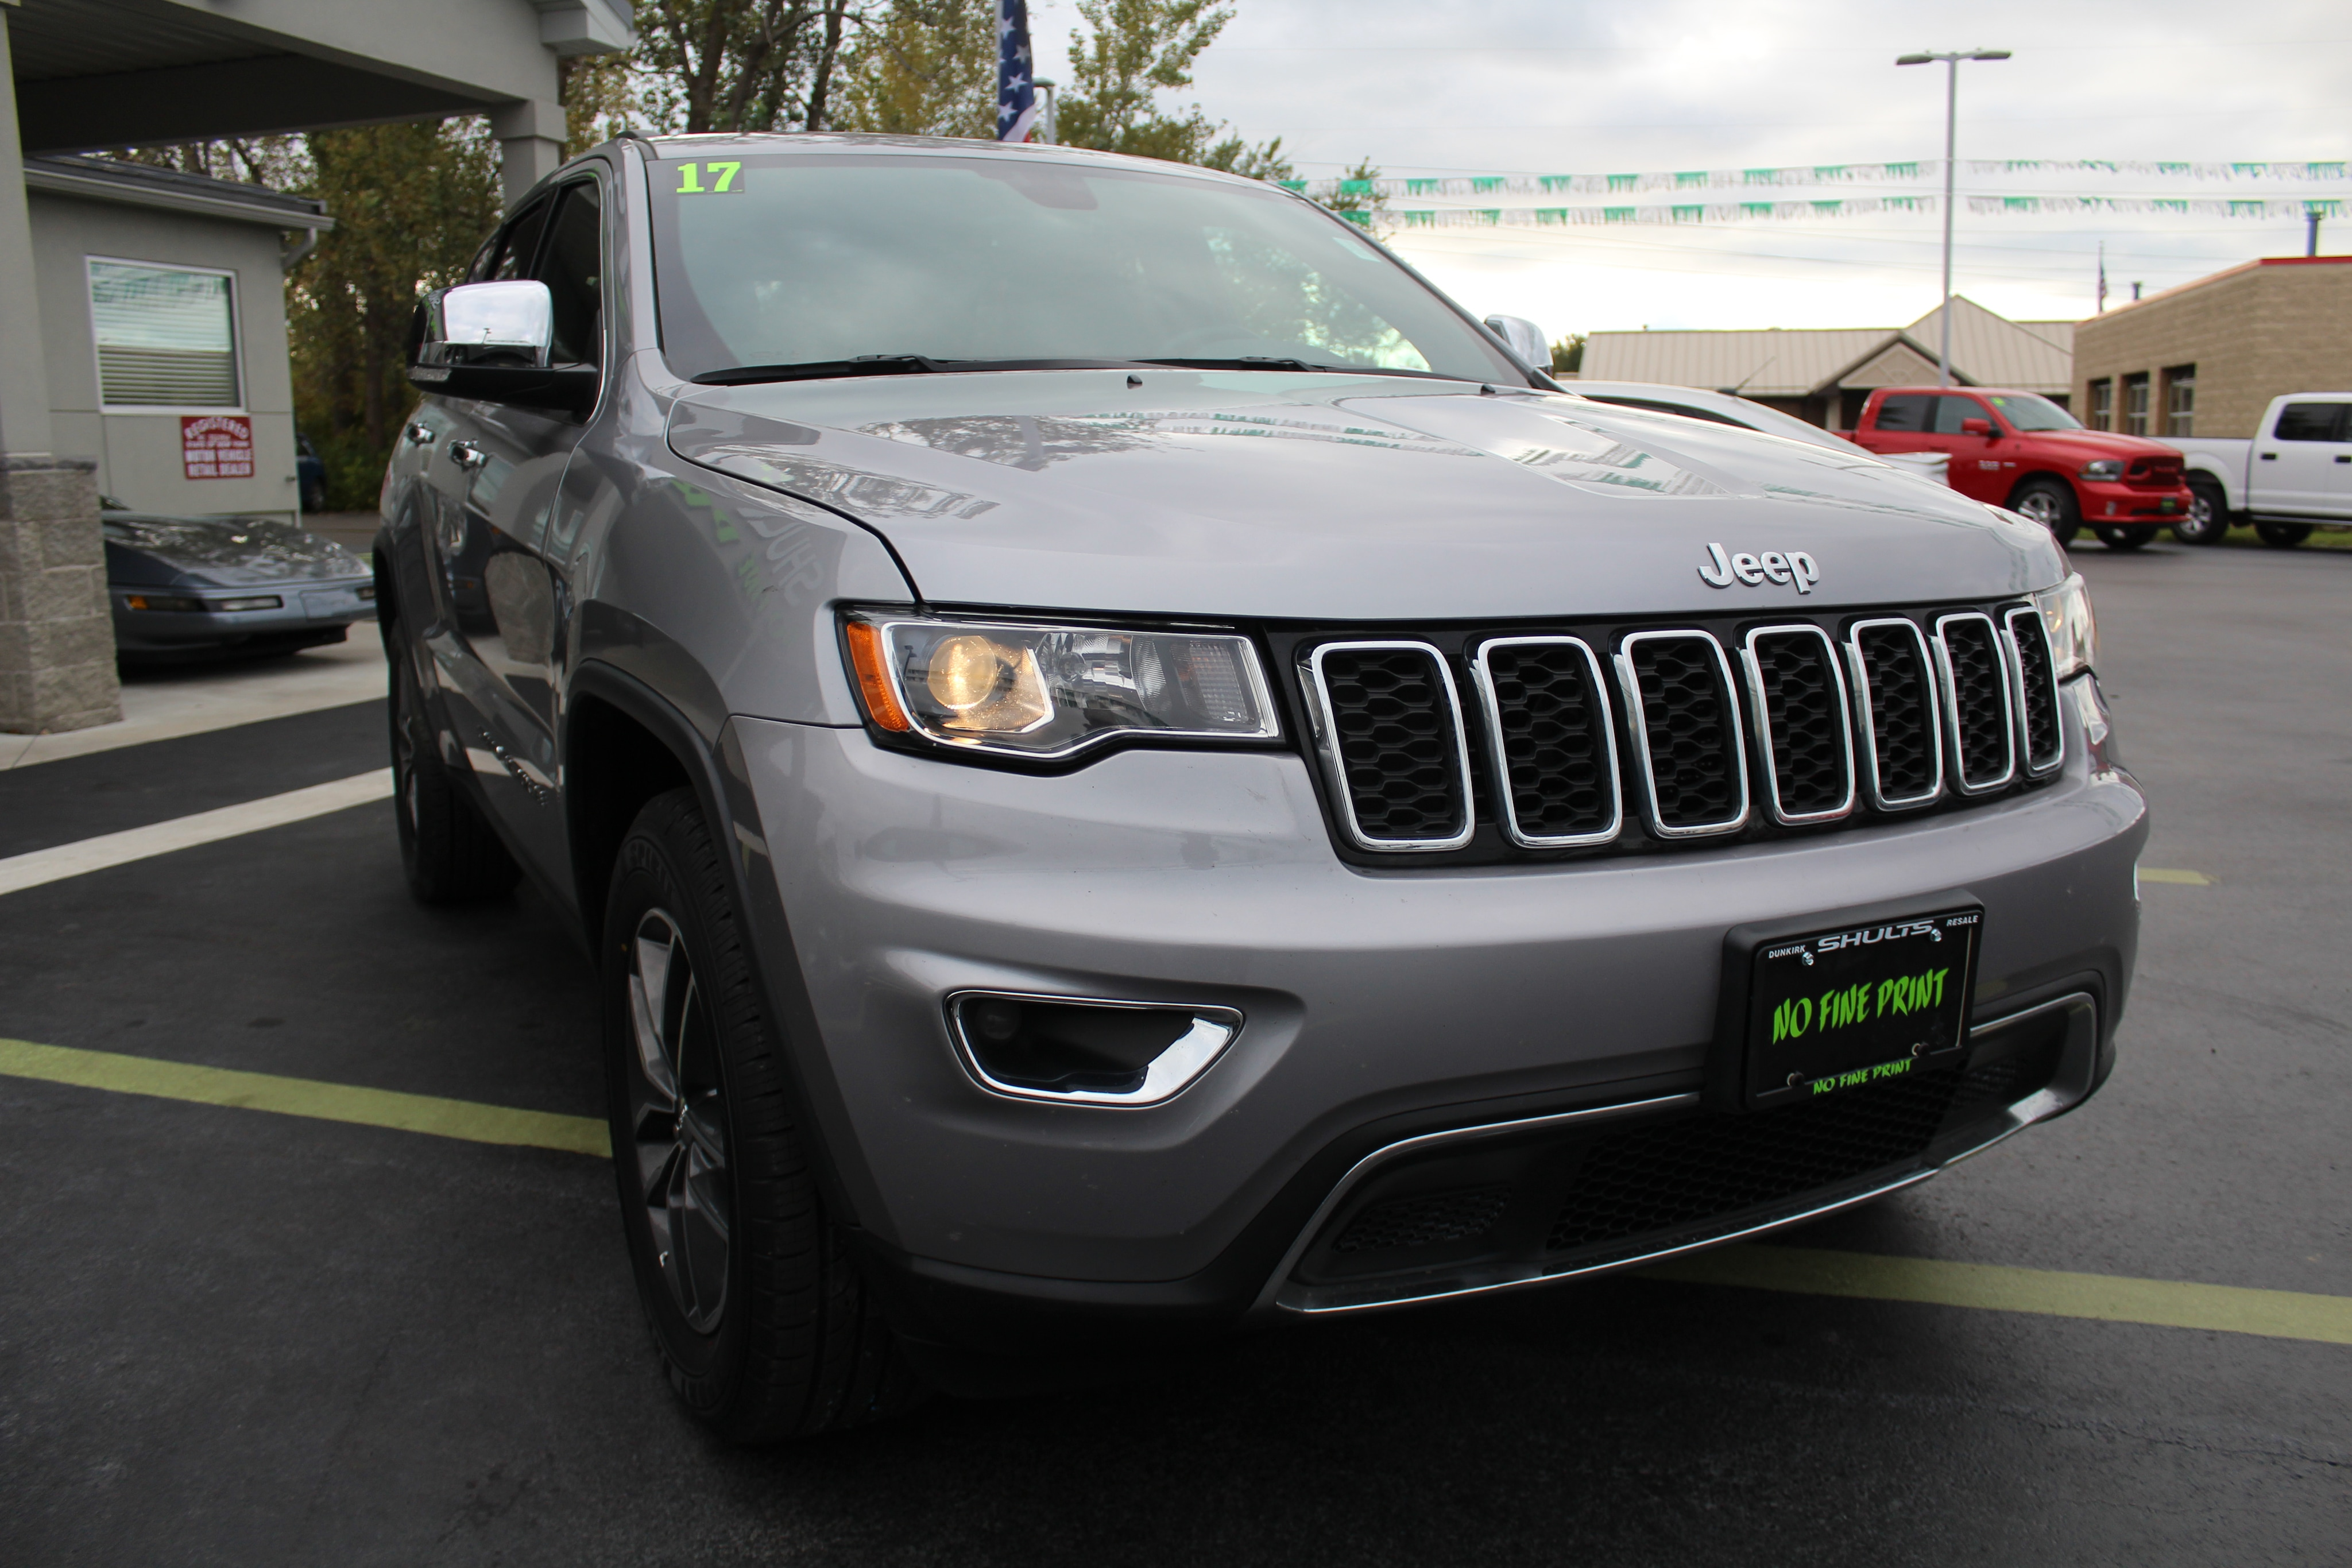 2017 Jeep Grand Cherokee Wagon 4 Dr.